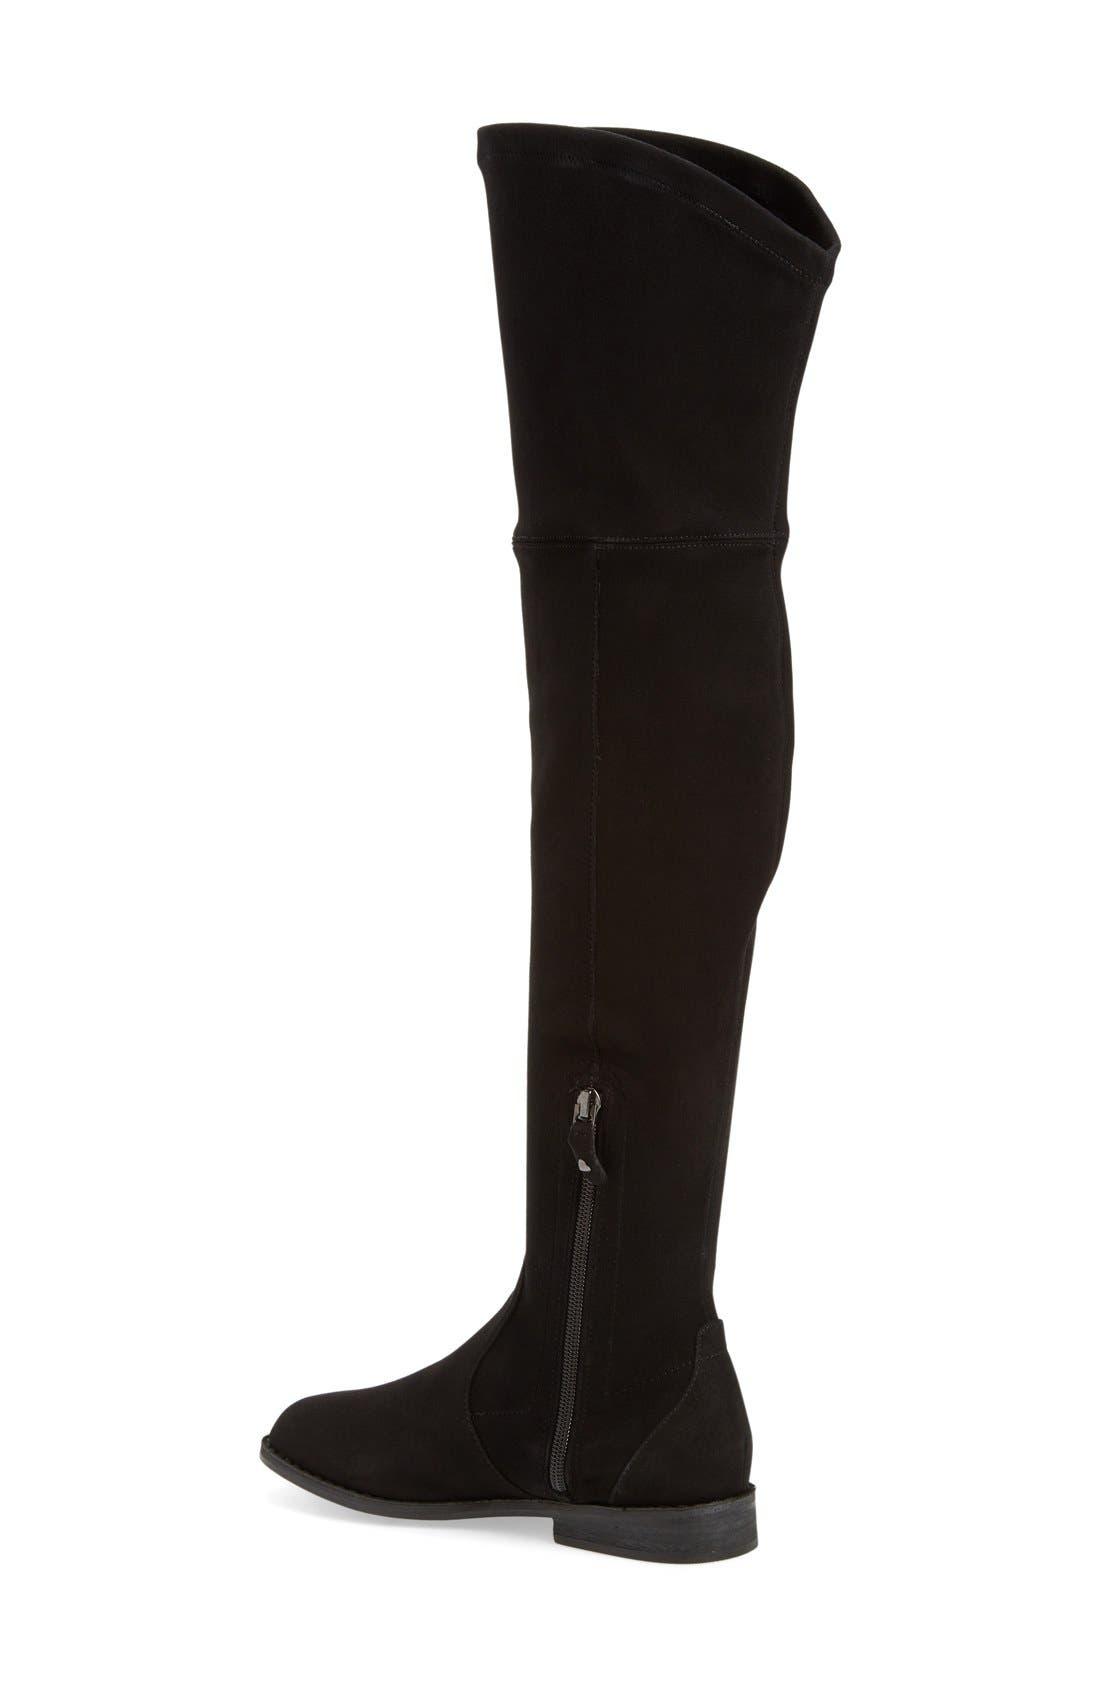 Alternate Image 2  - Gentle Souls 'Emma' Over the Knee Boot (Women) (Narrow Calf)